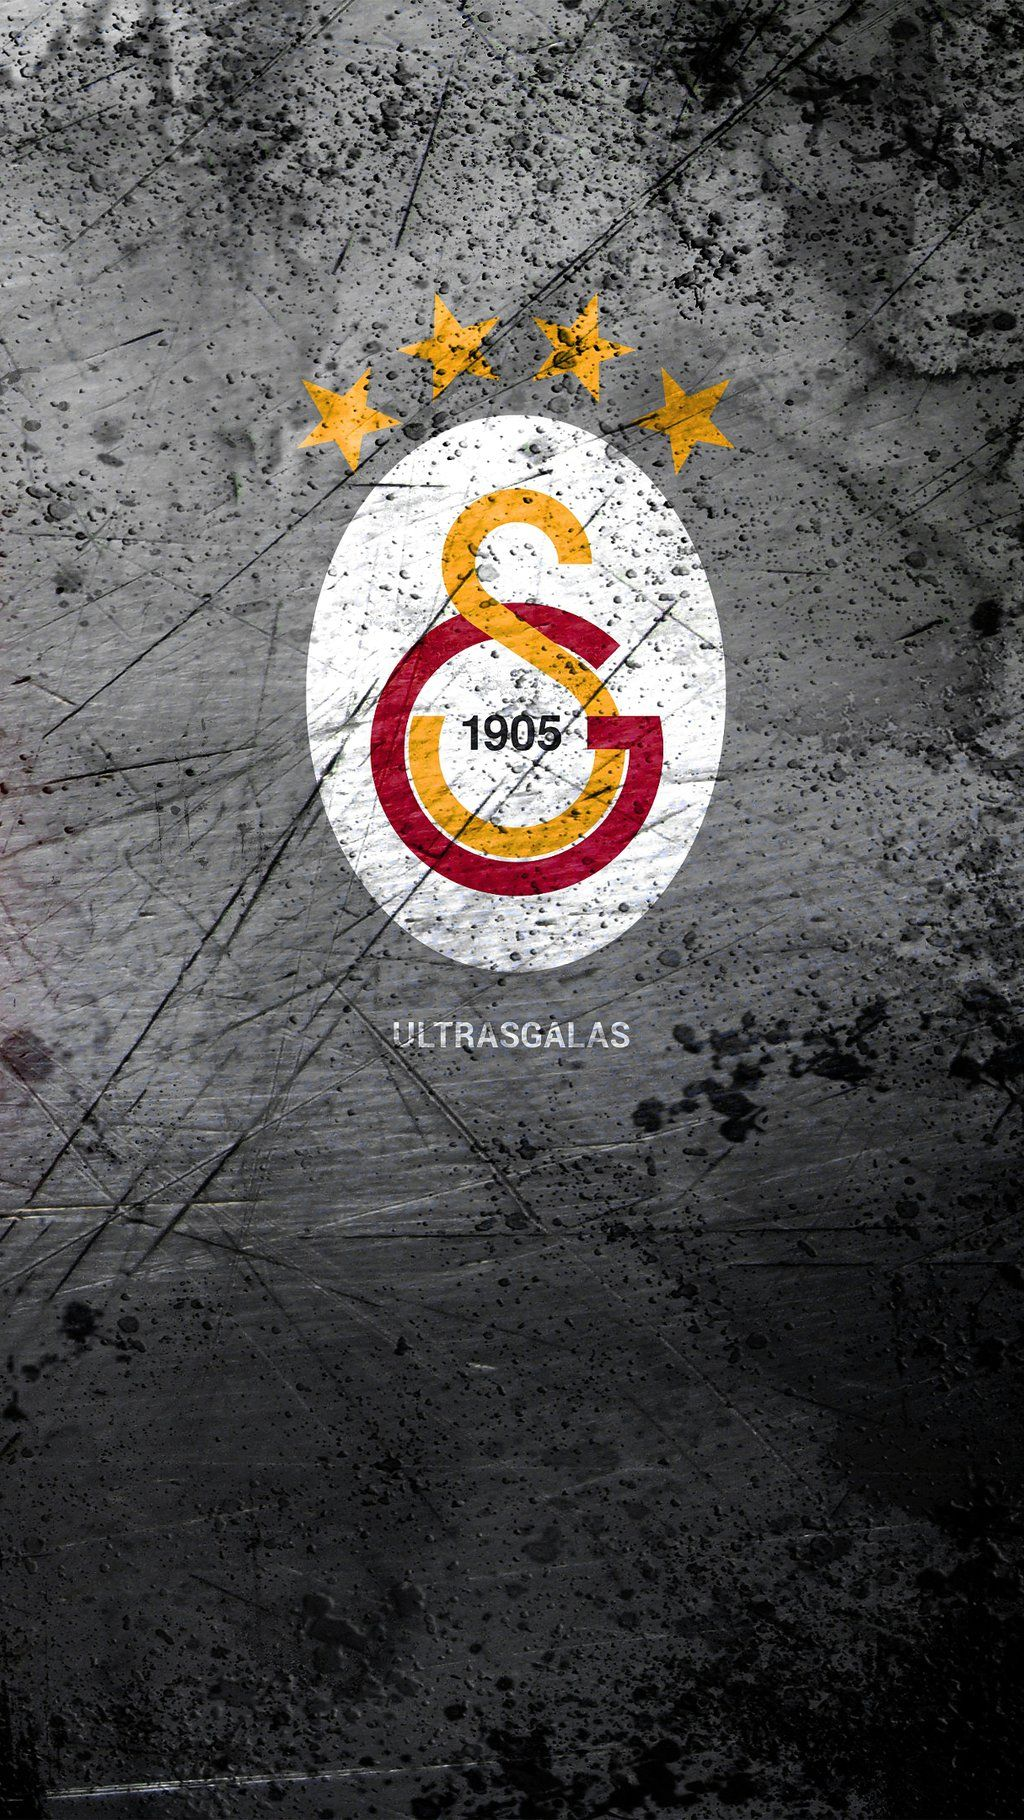 Galatasaray Wallpaper Hd Ile Ilgili Görsel Sonucu Telefon Arka